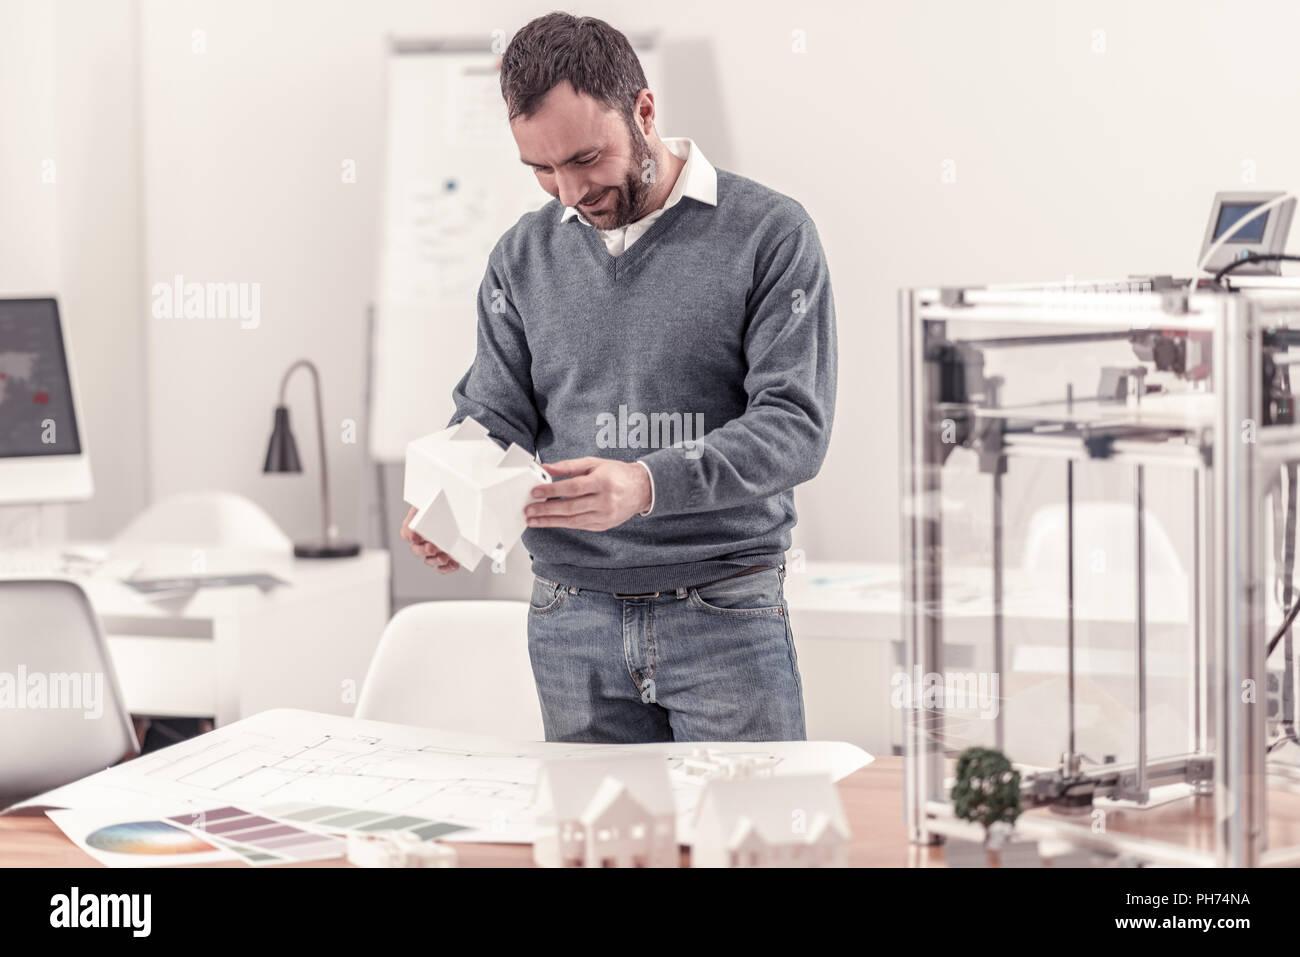 Ingenious designer holding model of a house - Stock Image